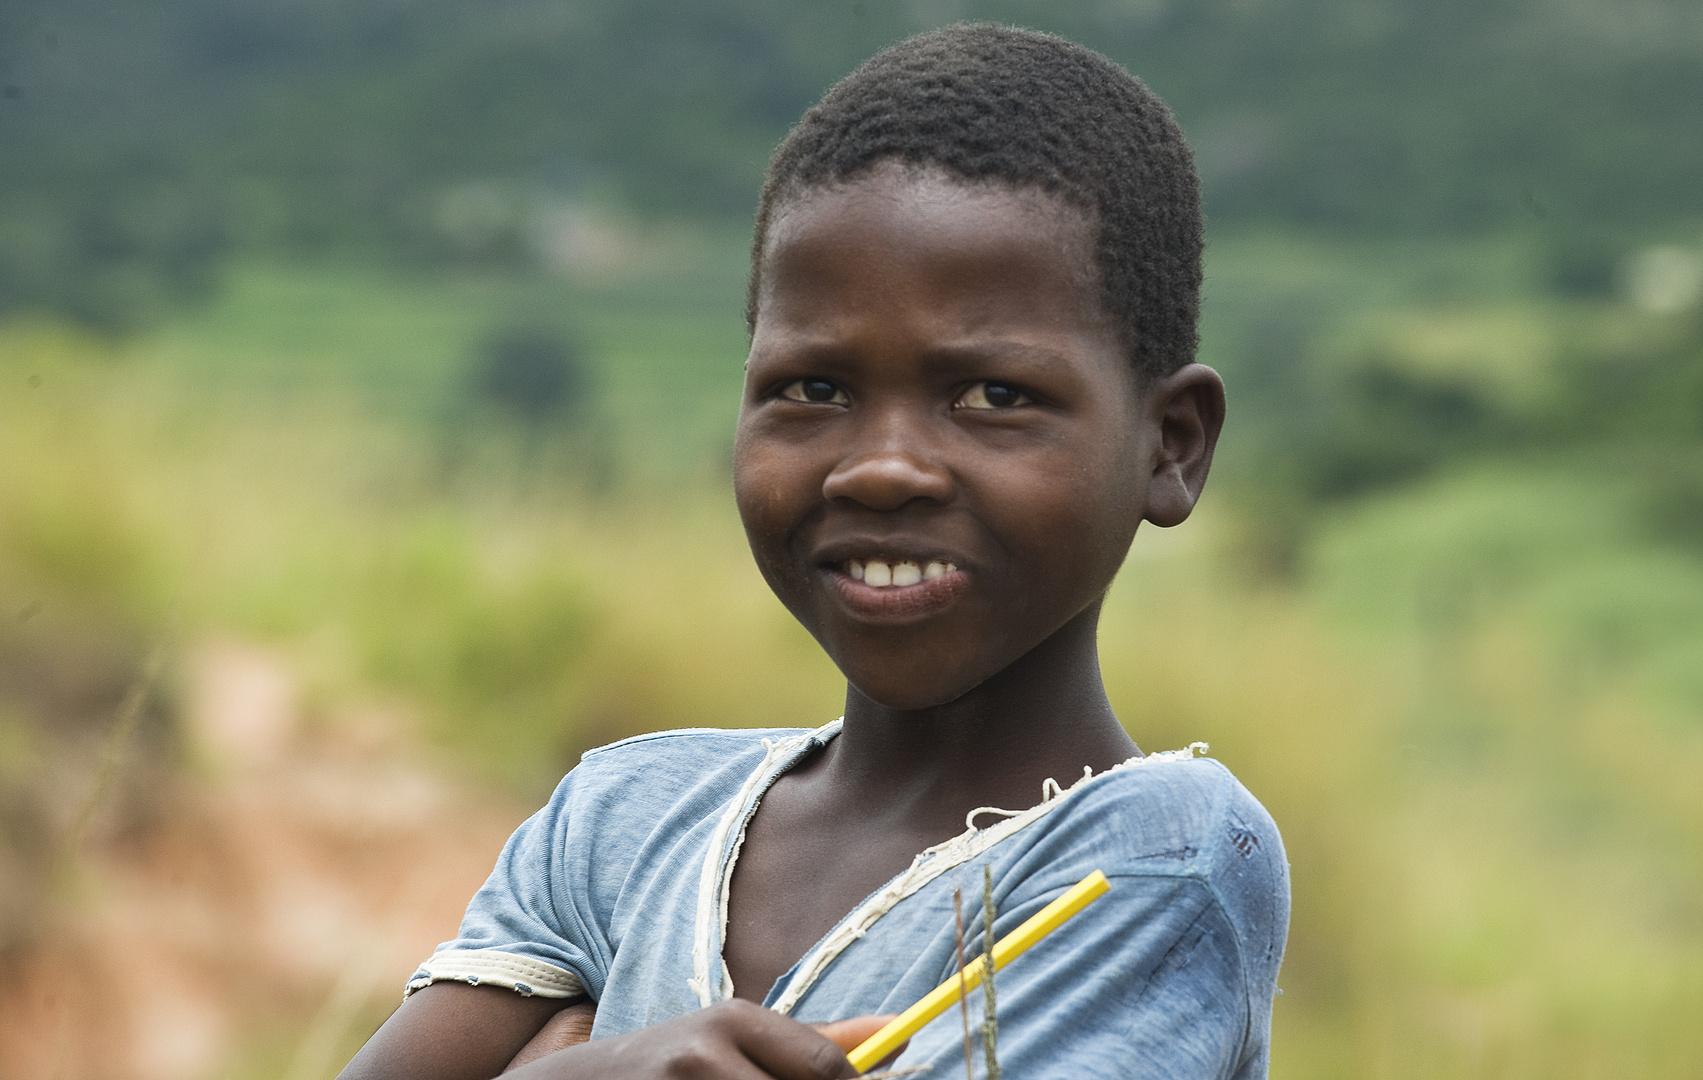 Blicke aus Afrika: Swaziland Nr.6